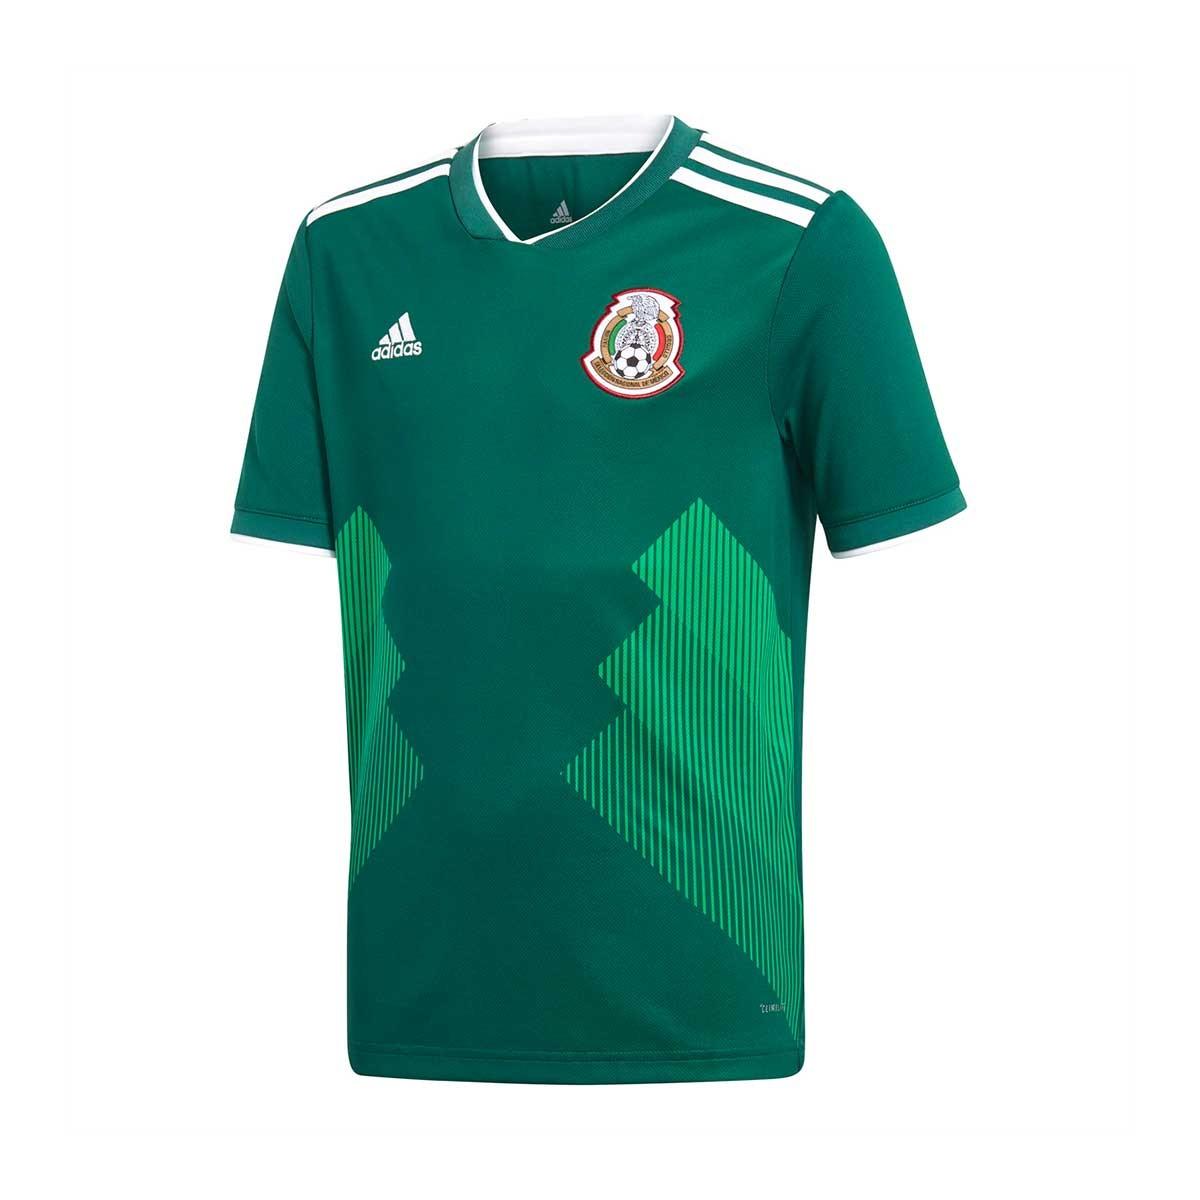 1900532920e5f Camiseta adidas Mexico Primera Equipación 2017-2018 Niño Collegiate  green-White - Tienda de fútbol Fútbol Emotion